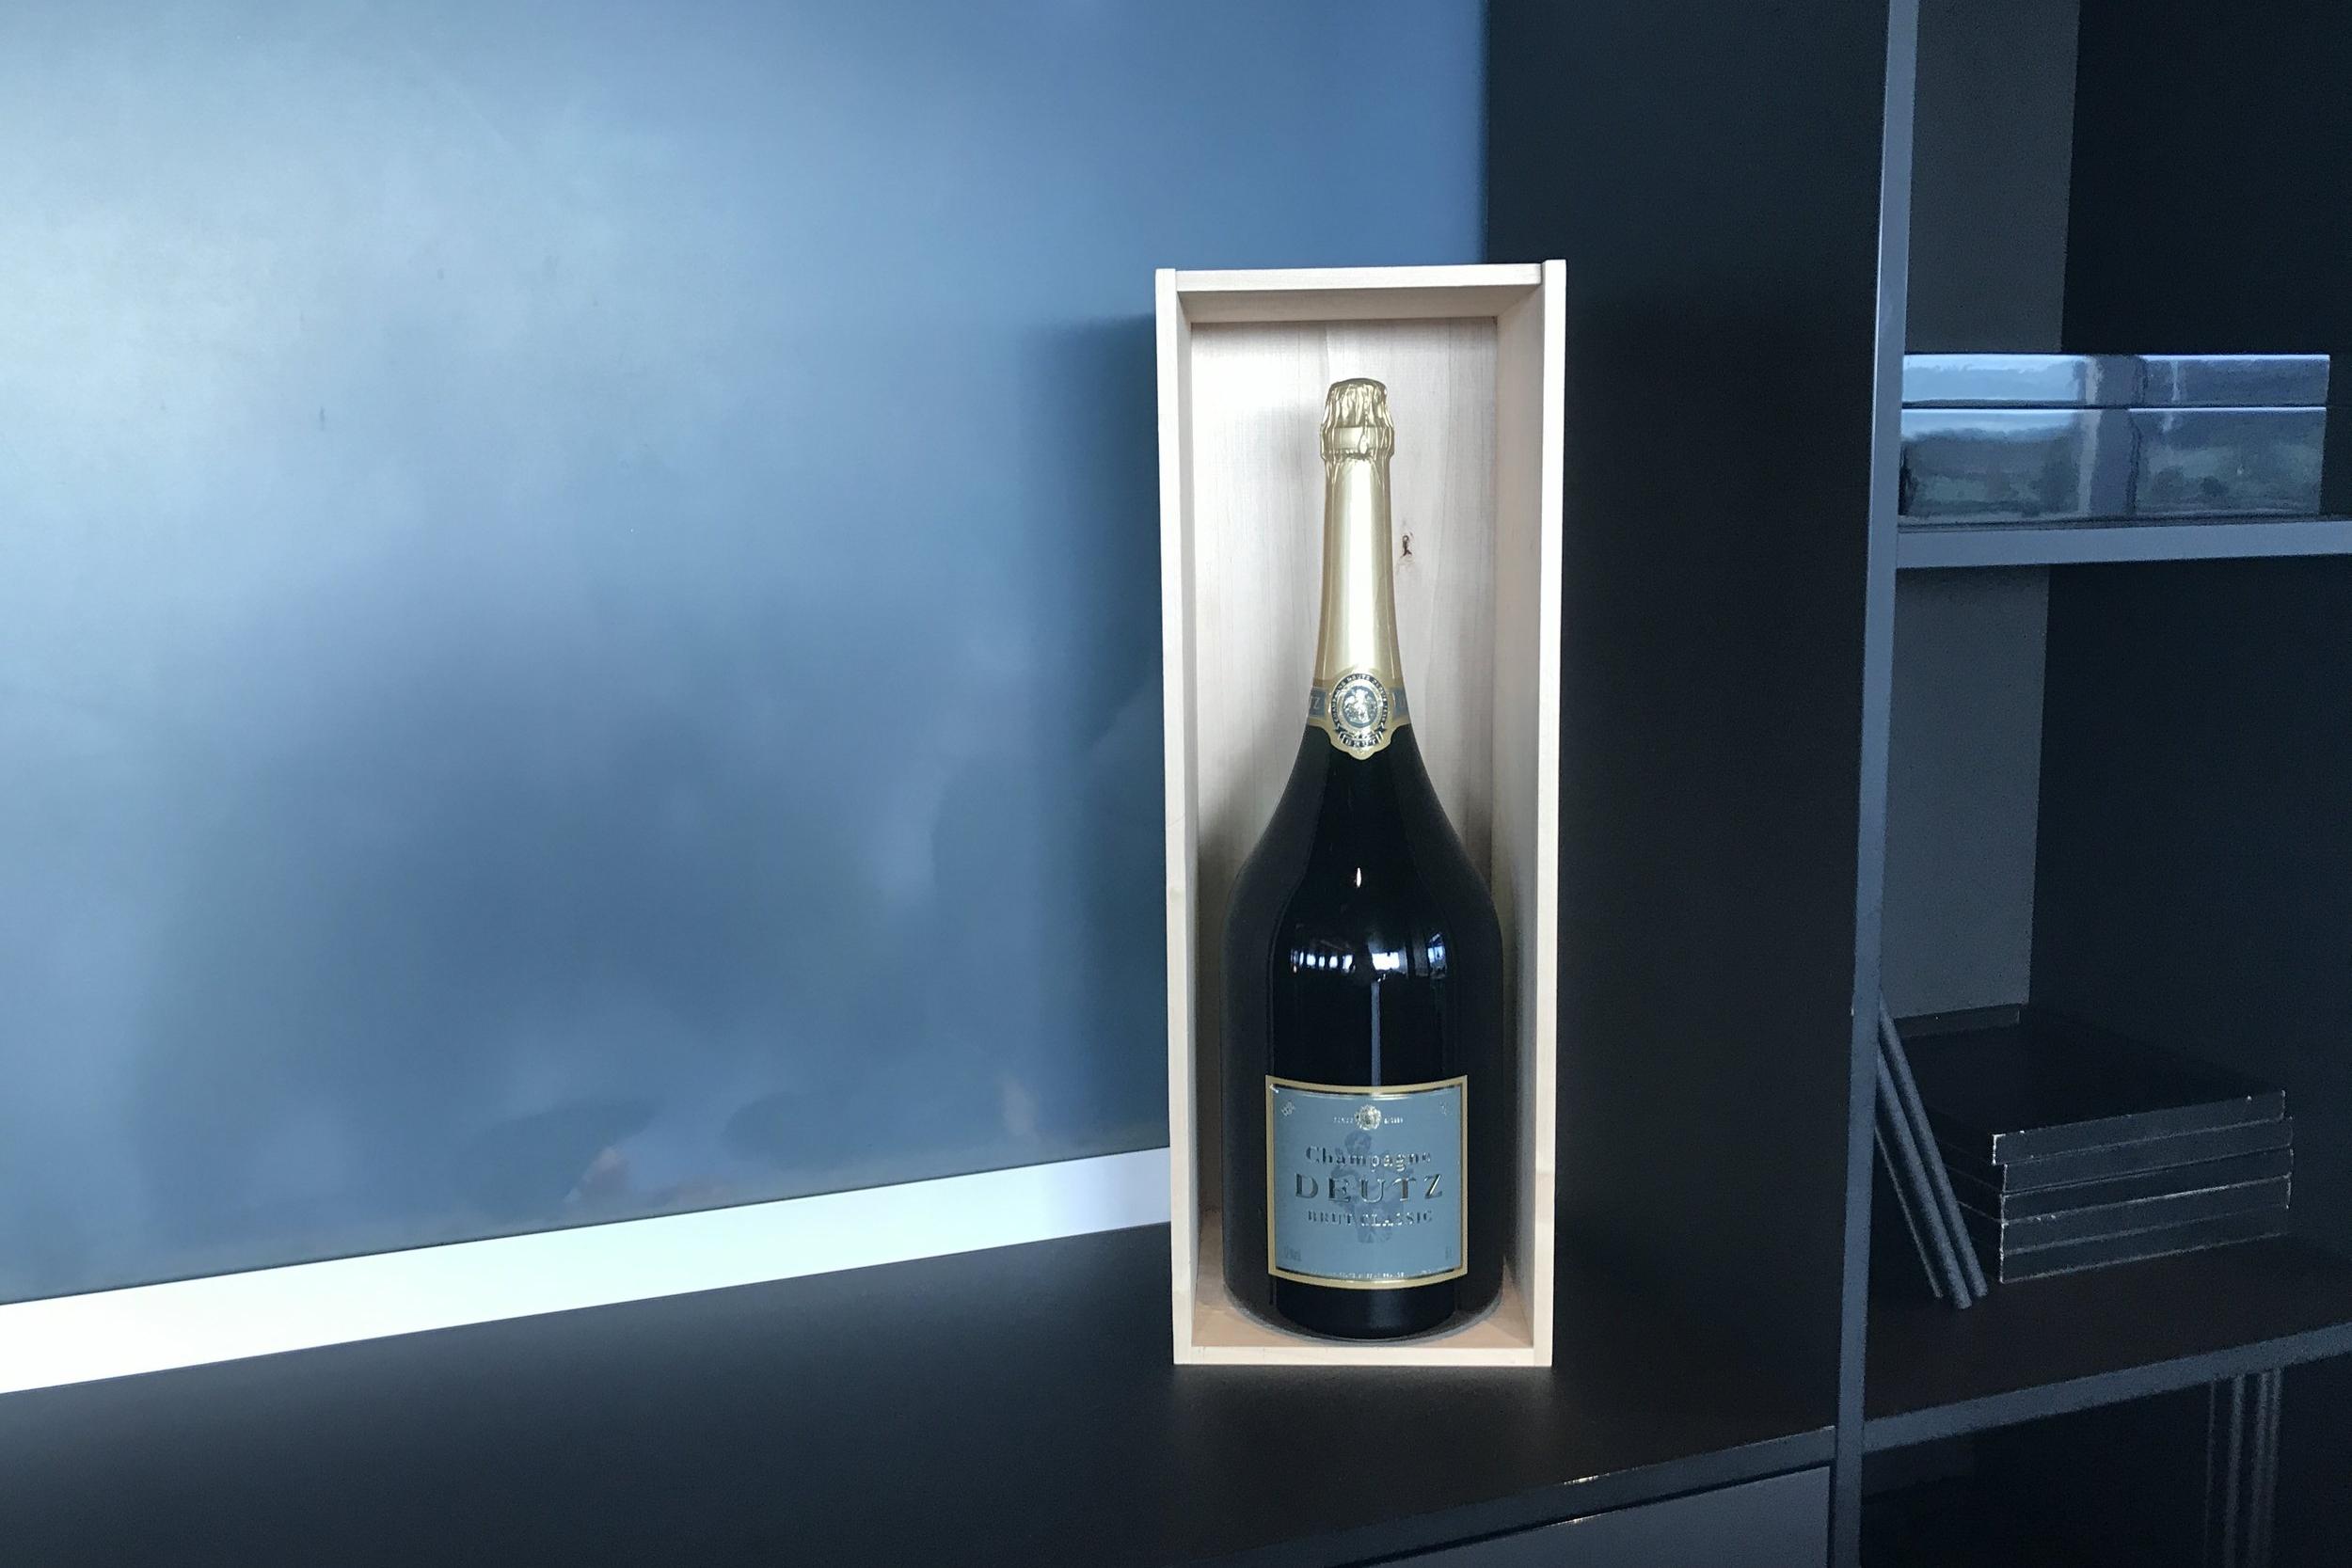 Swiss First Class Lounge Zurich – Giant bottle of Deutz champagne